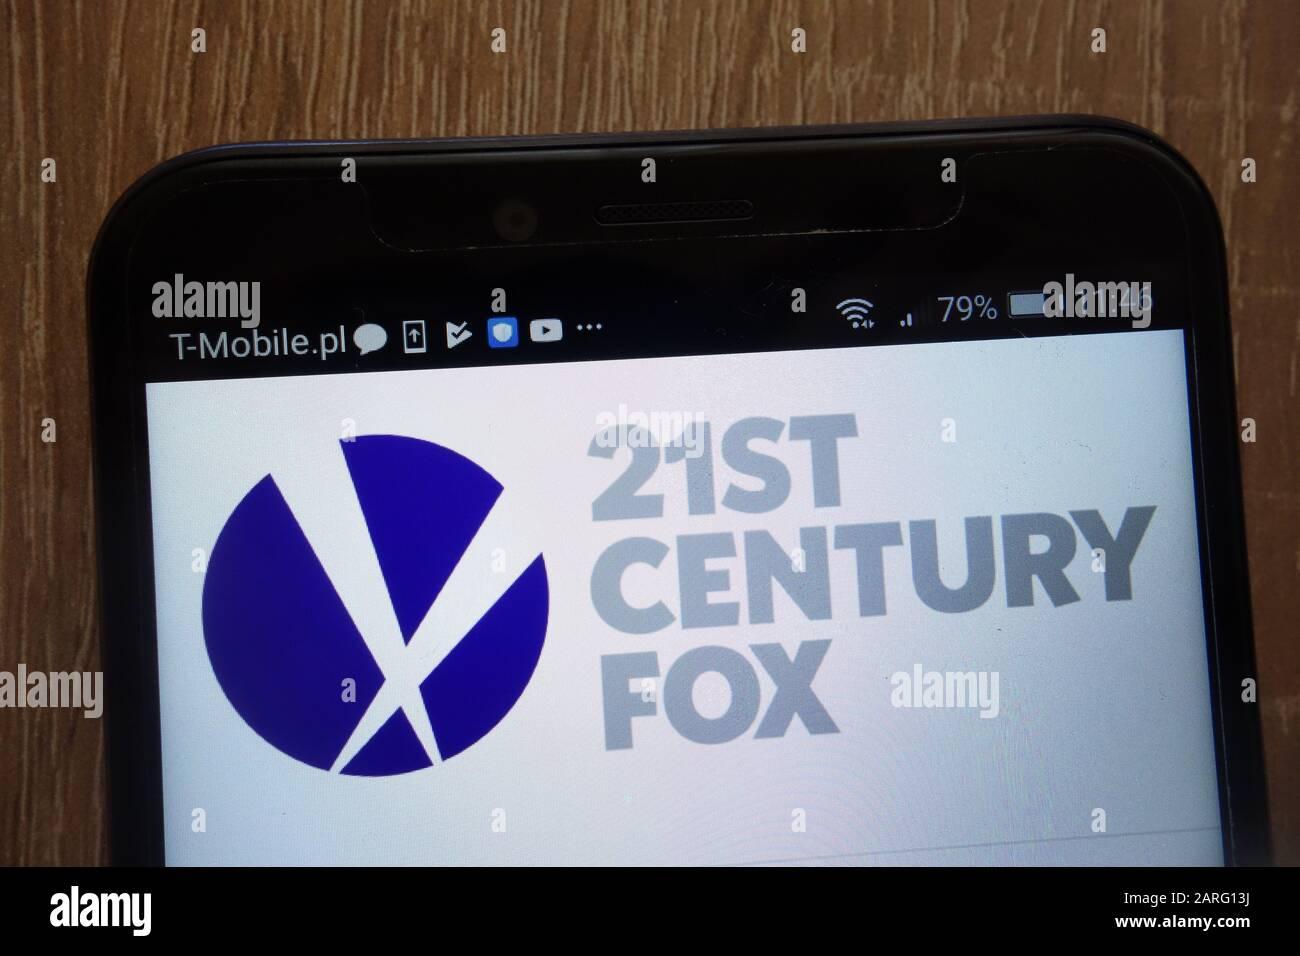 21st Century Fox logo displayed on a modern smartphone Stock Photo